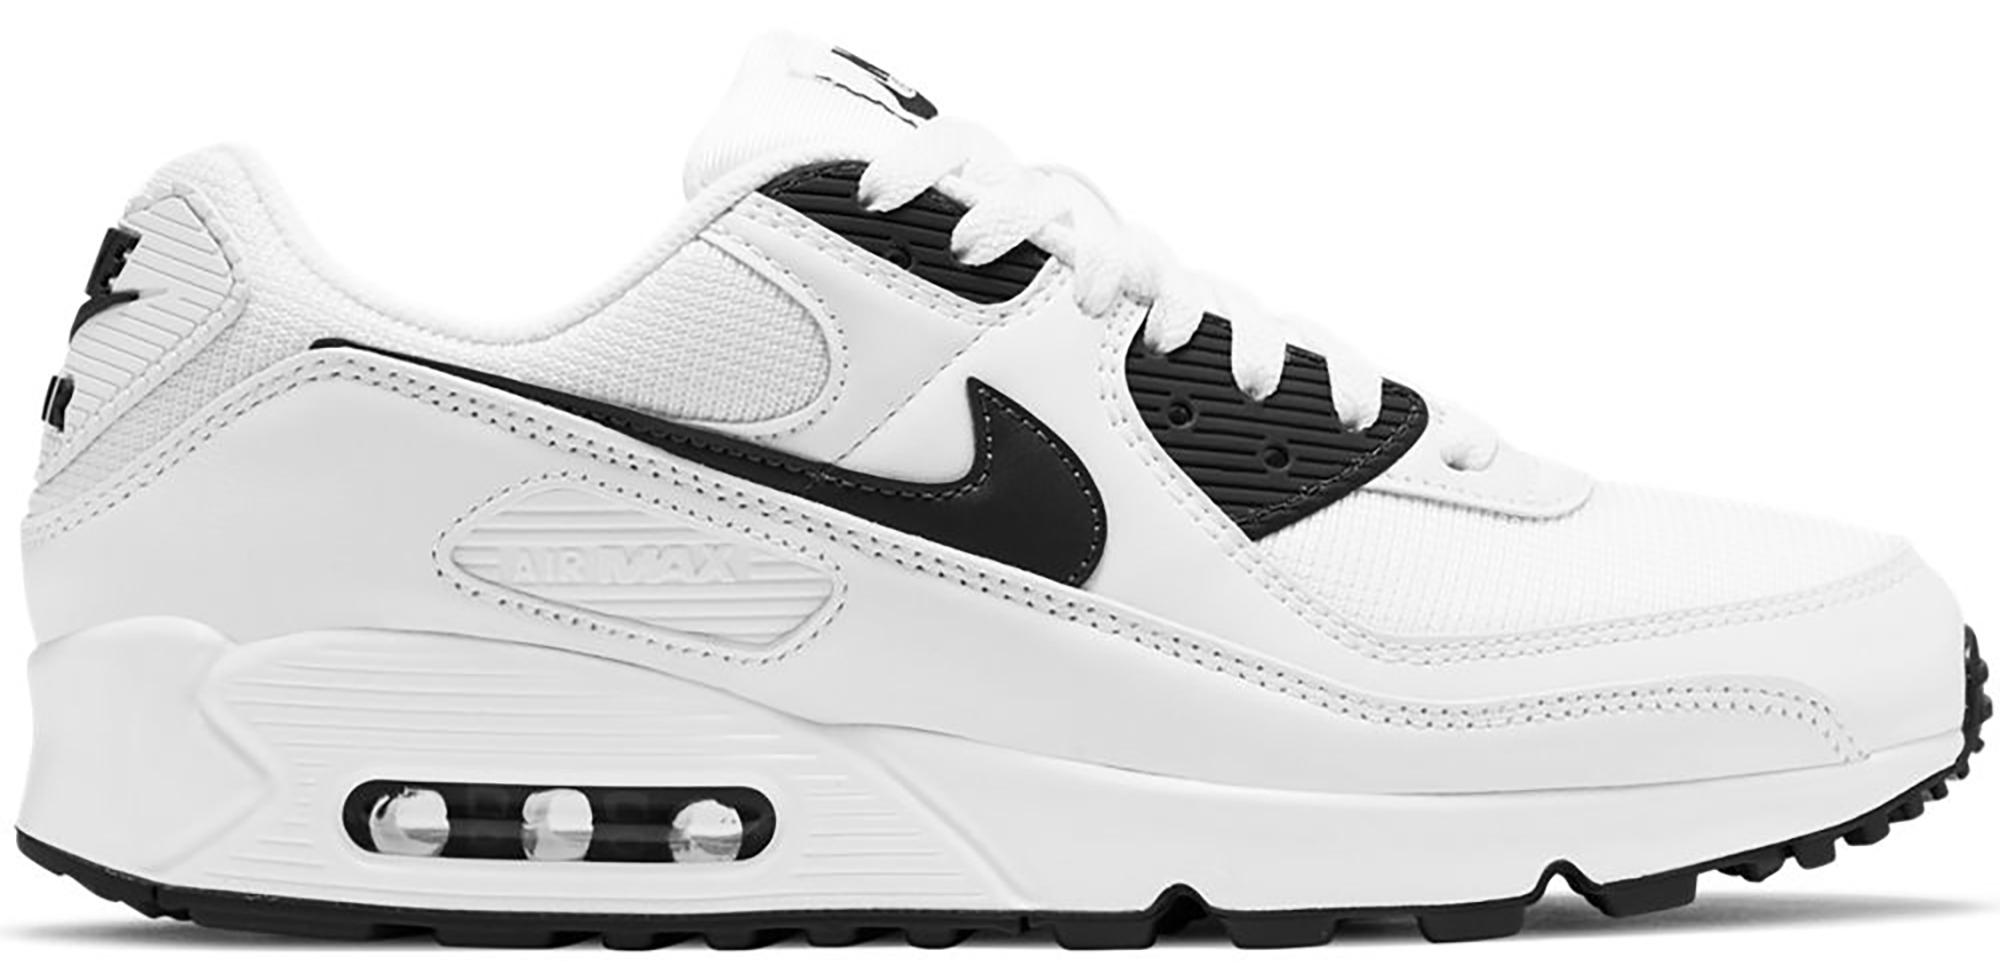 Nike Air Max 90 White Black (2020